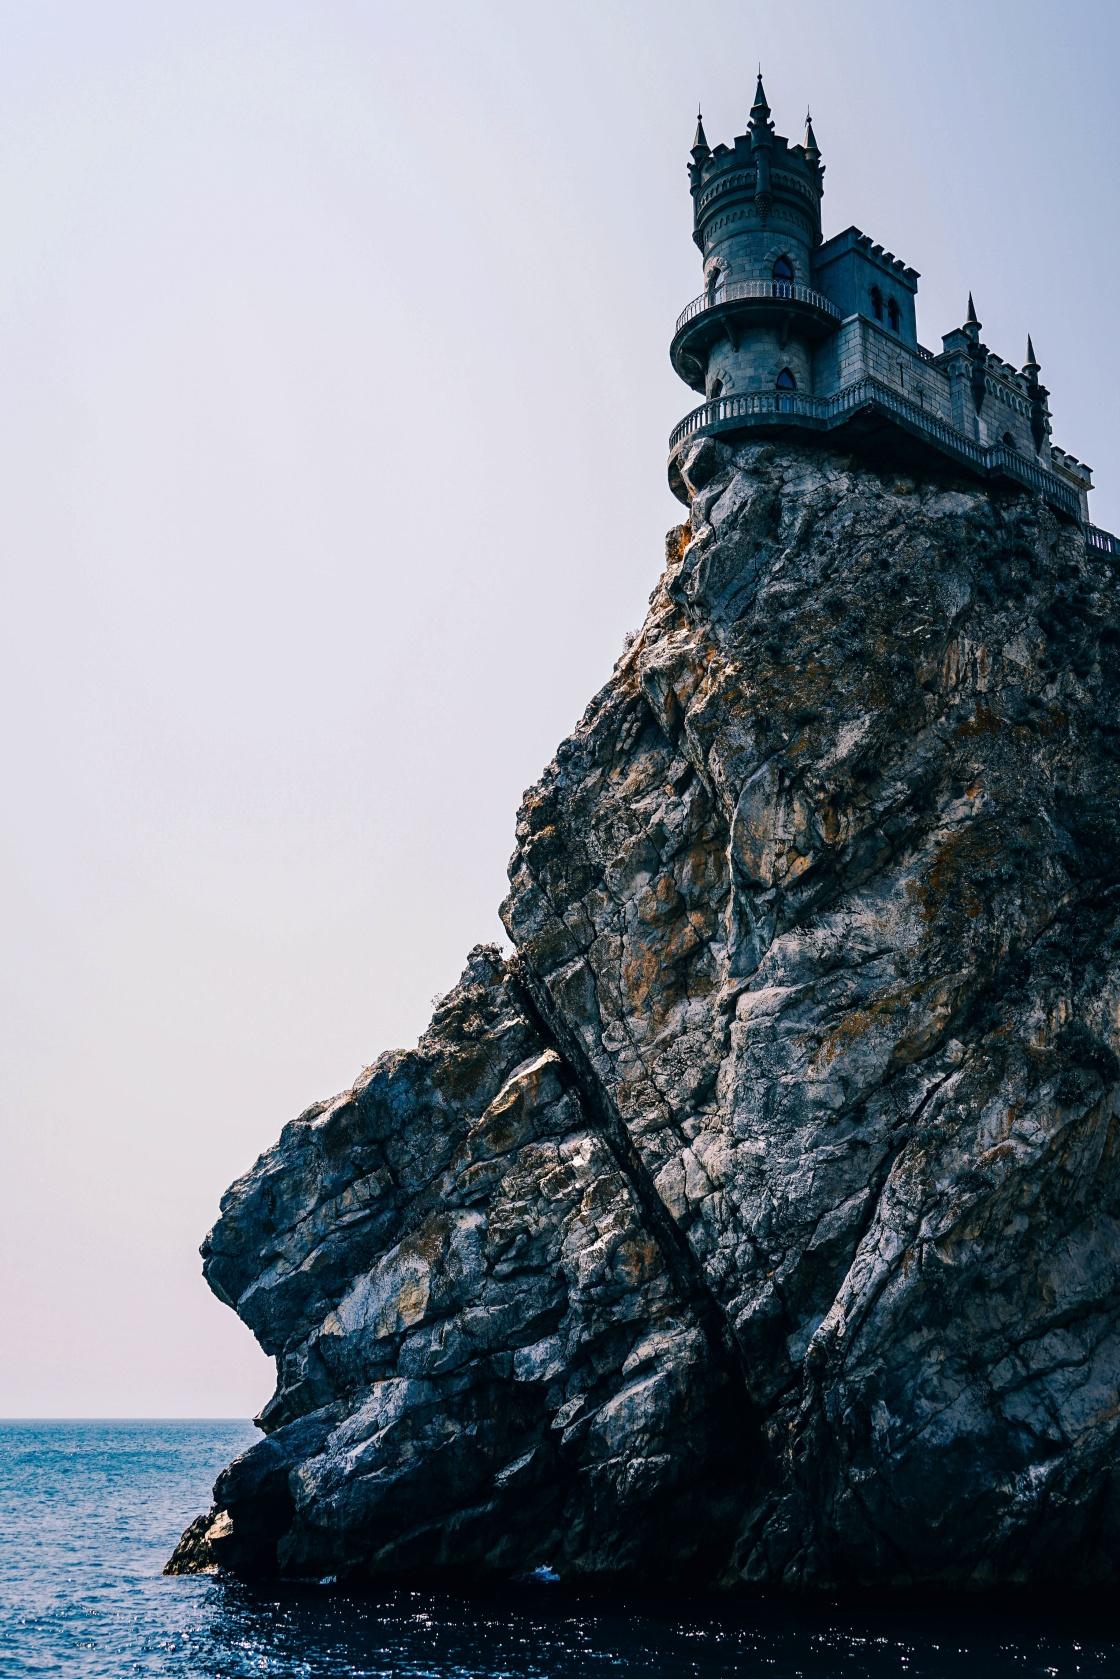 rock, formation, building, architecture, sky, sea, ocean, water, coast, hill, castle